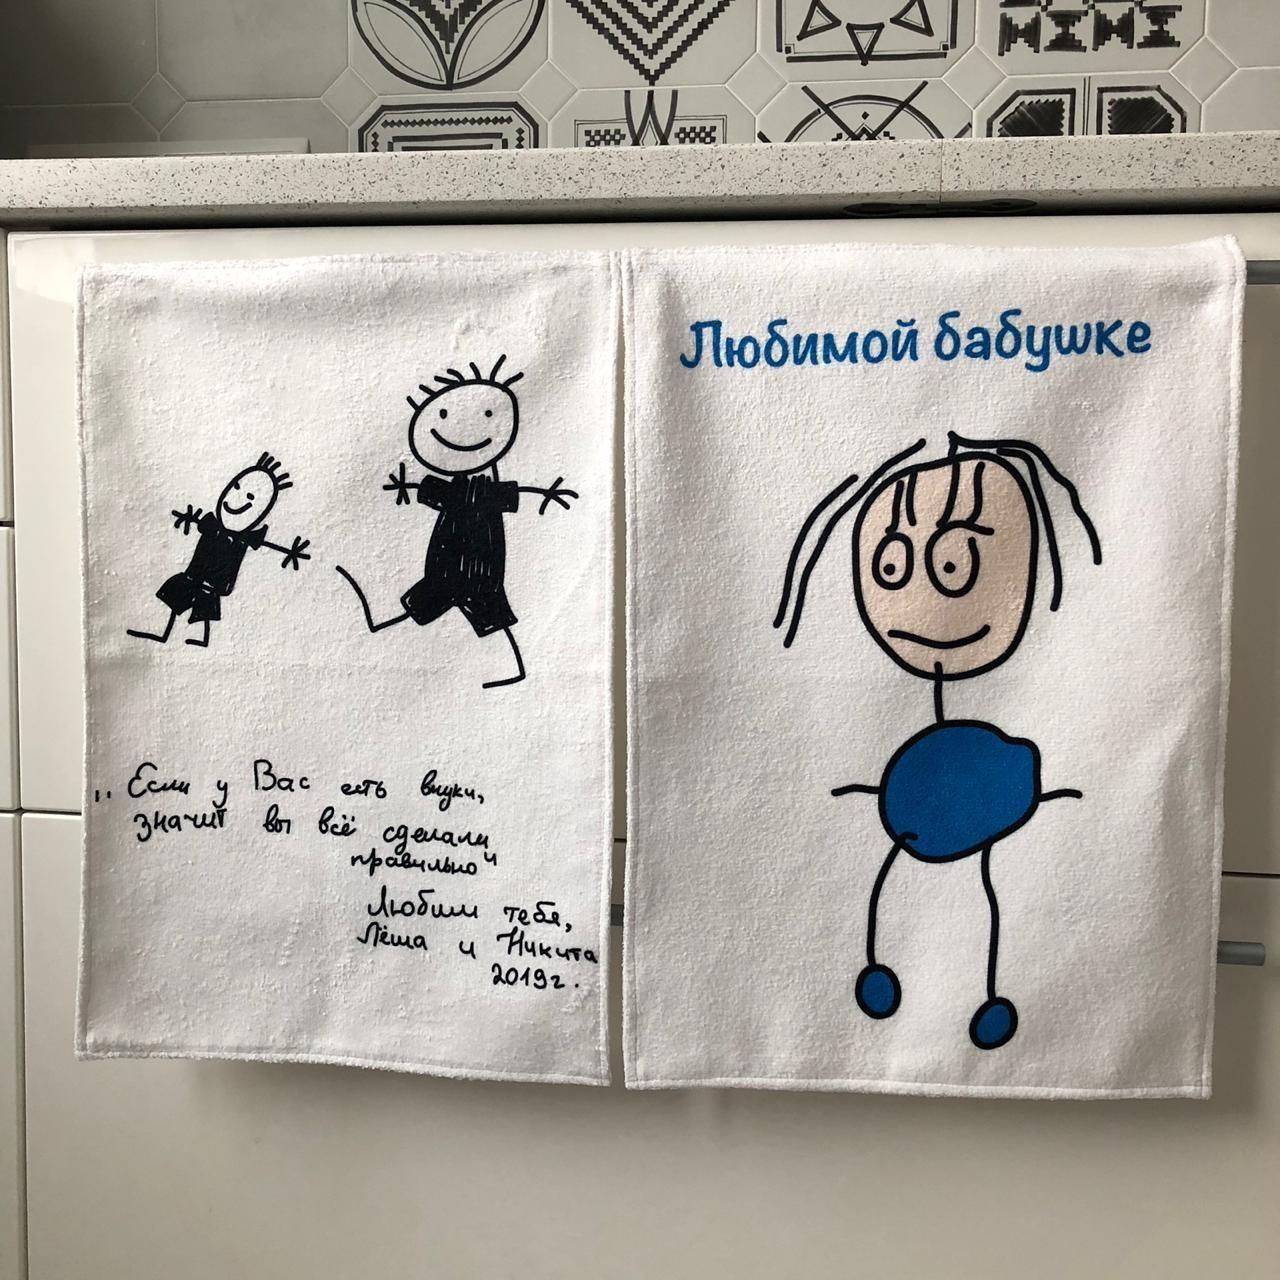 Кухонное полотенце по рисункам/отпечаткам (2 шт.)